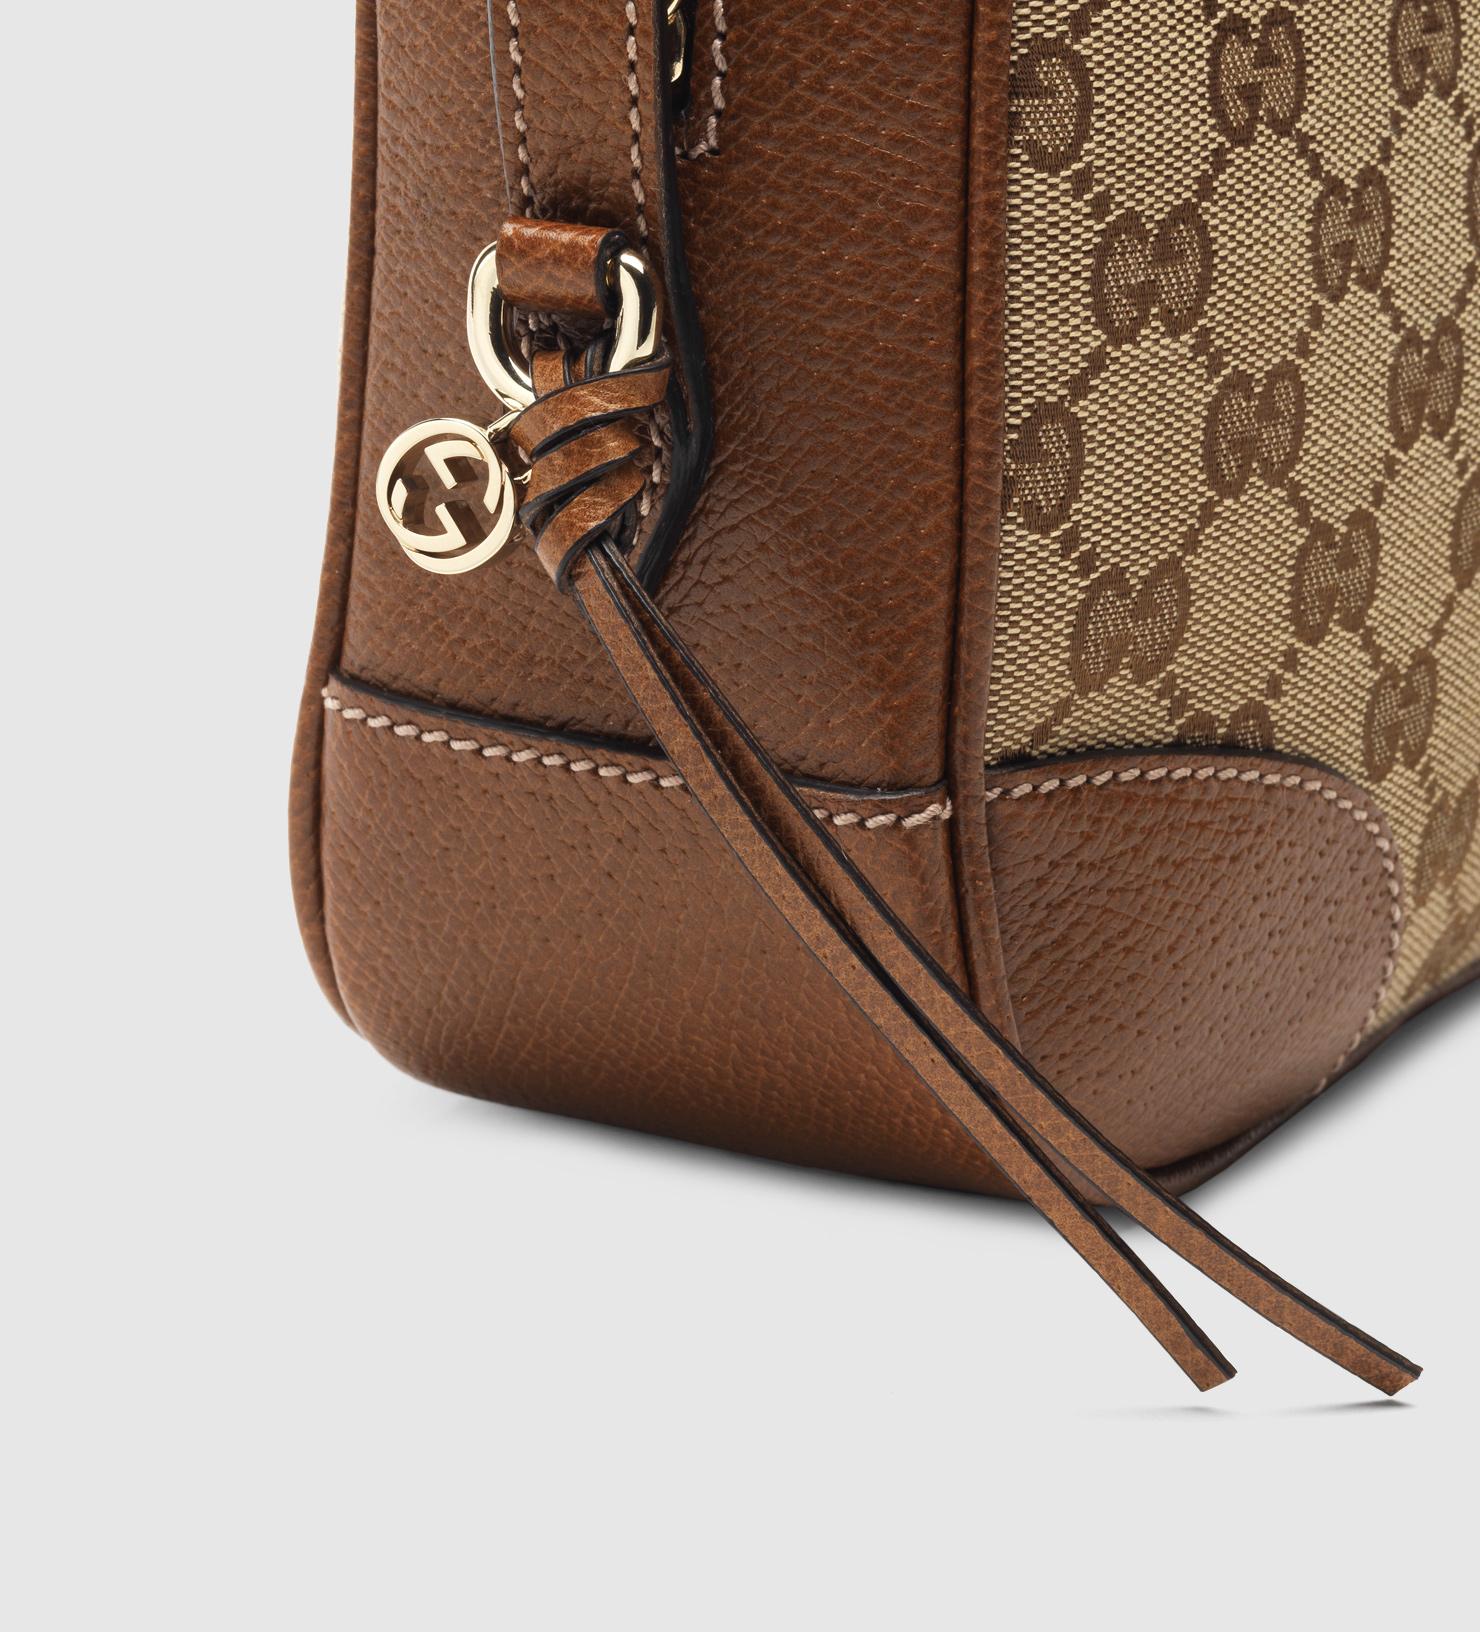 335435ce0d549c Gucci Bree Original Gg Canvas Mini Messenger Bag in Brown - Lyst